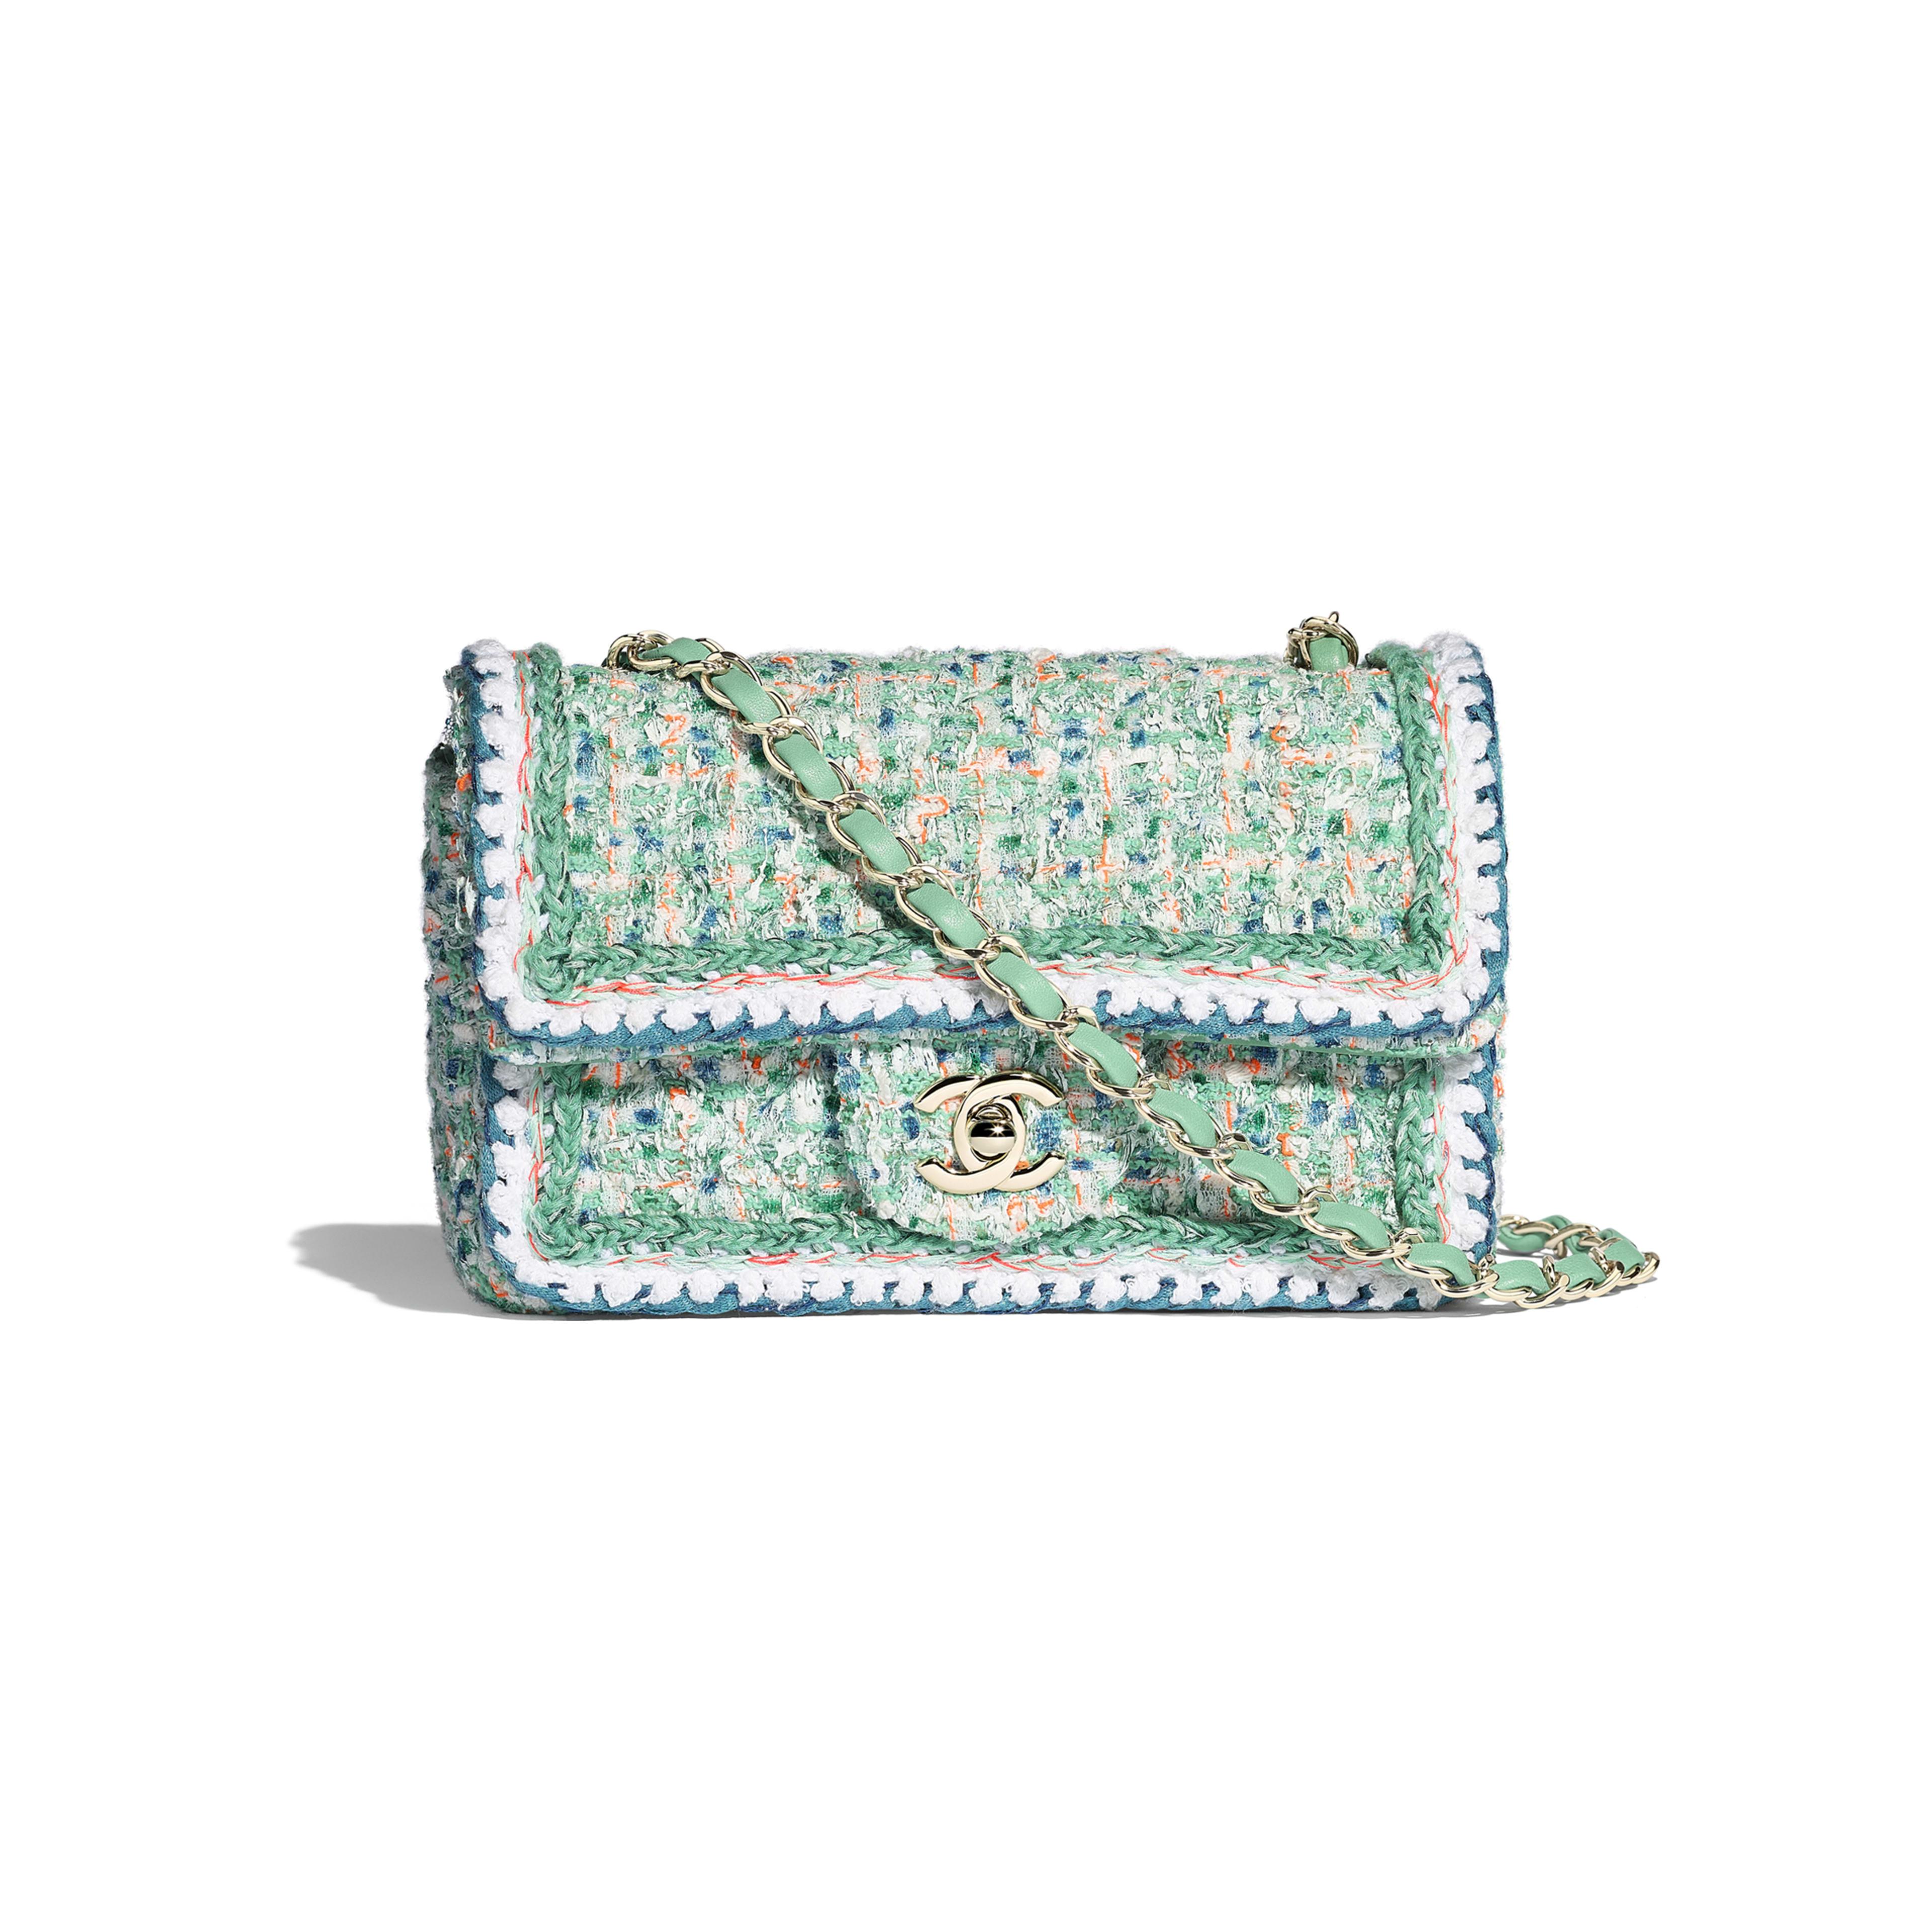 Mini Flap Bag - Green, White, Blue & Orange - Tweed & Gold-Tone Metal - Default view - see full sized version